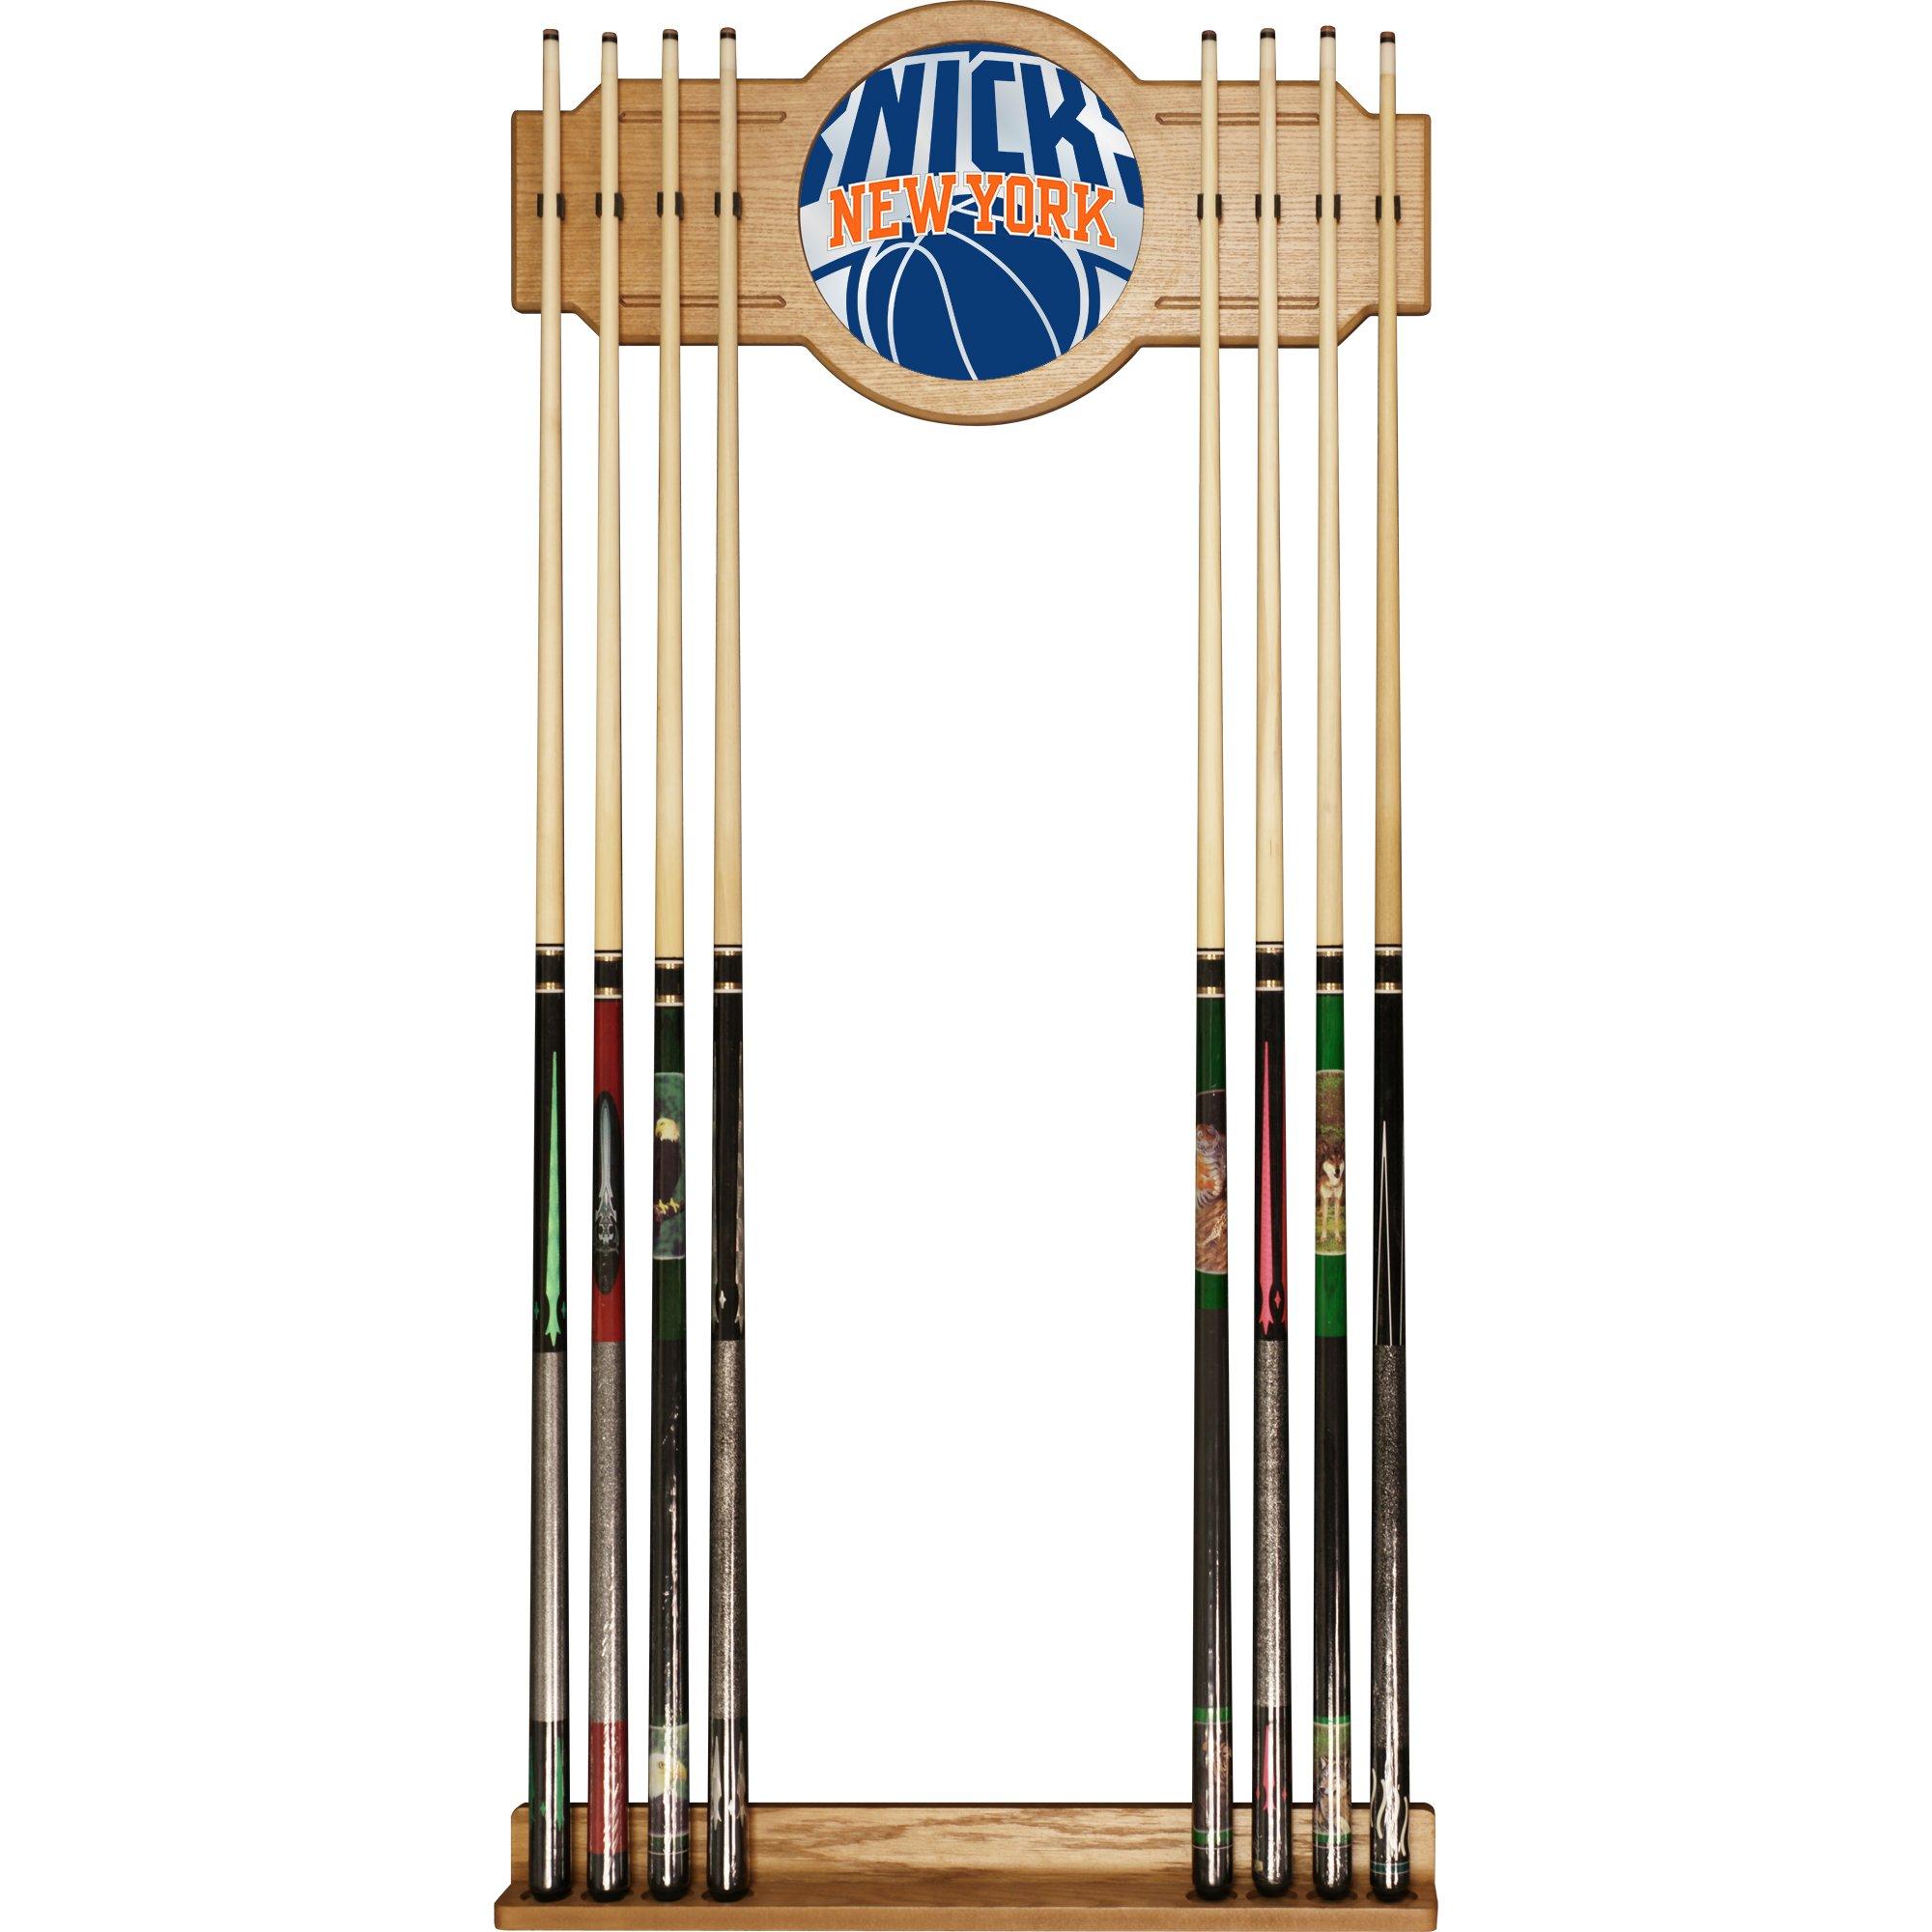 Trademark Gameroom NBA6000-NY2 NBA Cue Rack with Mirror - Fade - New York Knicks by Trademark Global